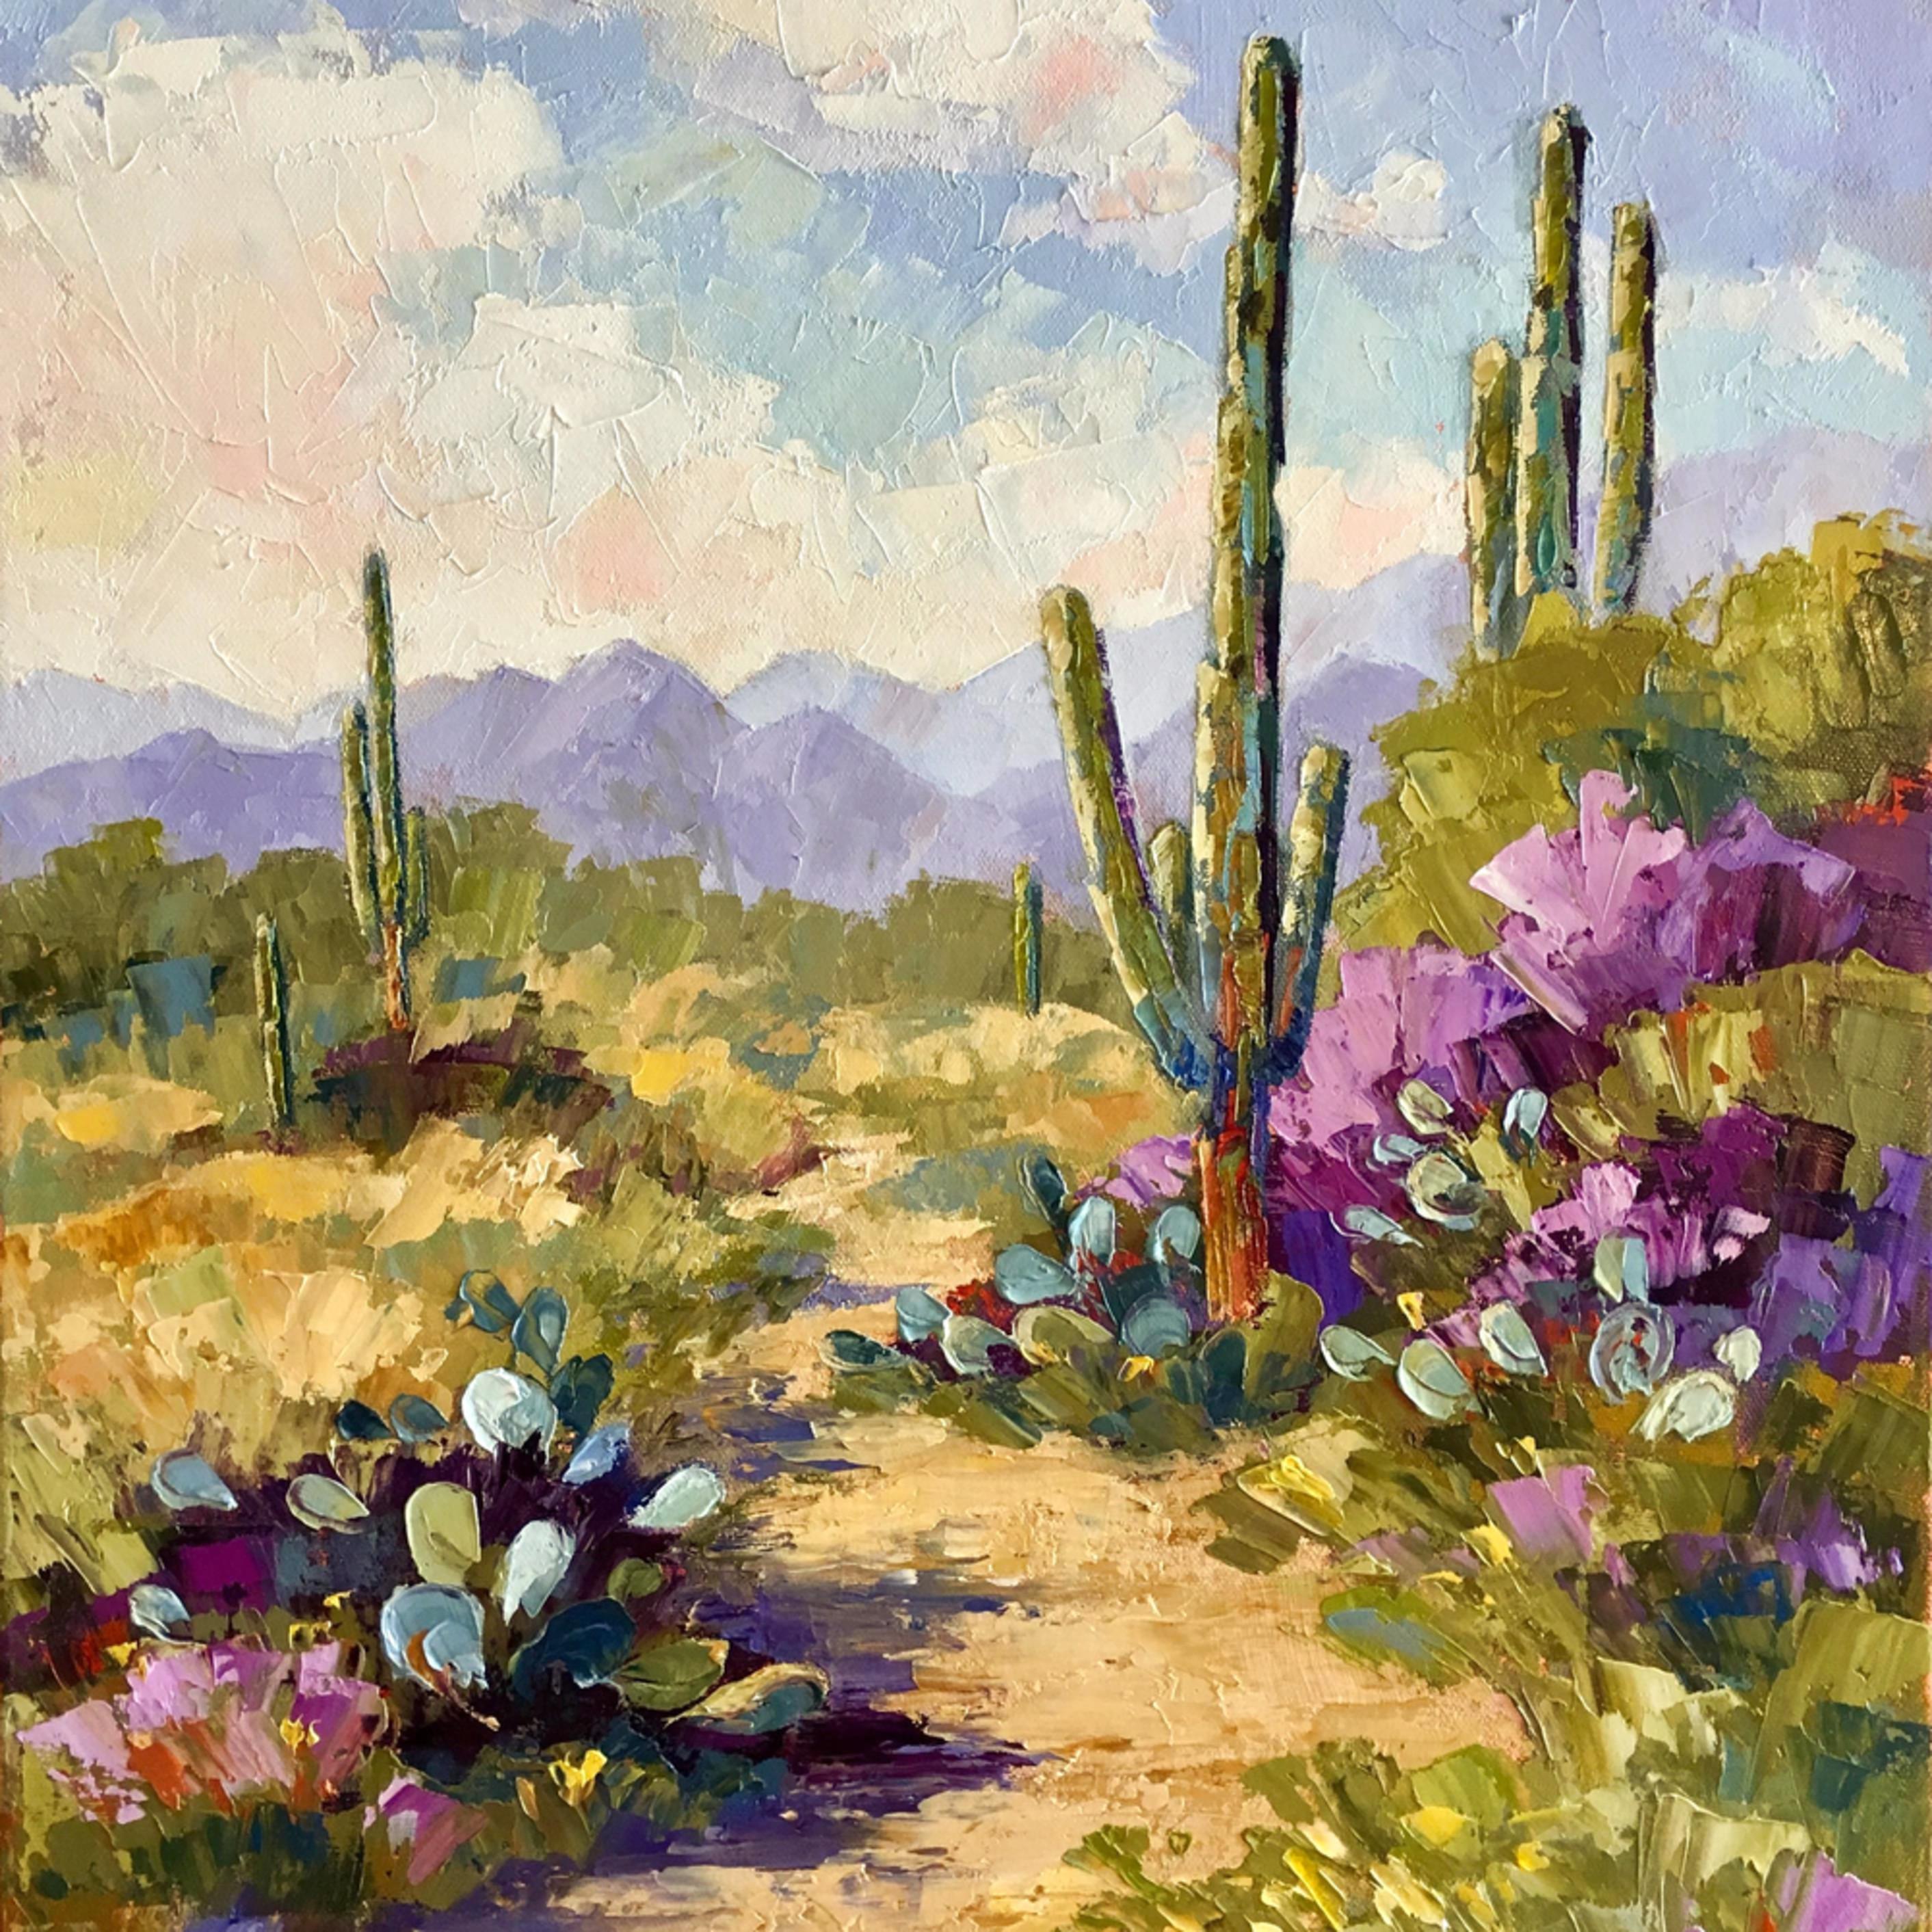 Saguaro trail 72dpi 3500px gimp colbal exp adjs crvldl